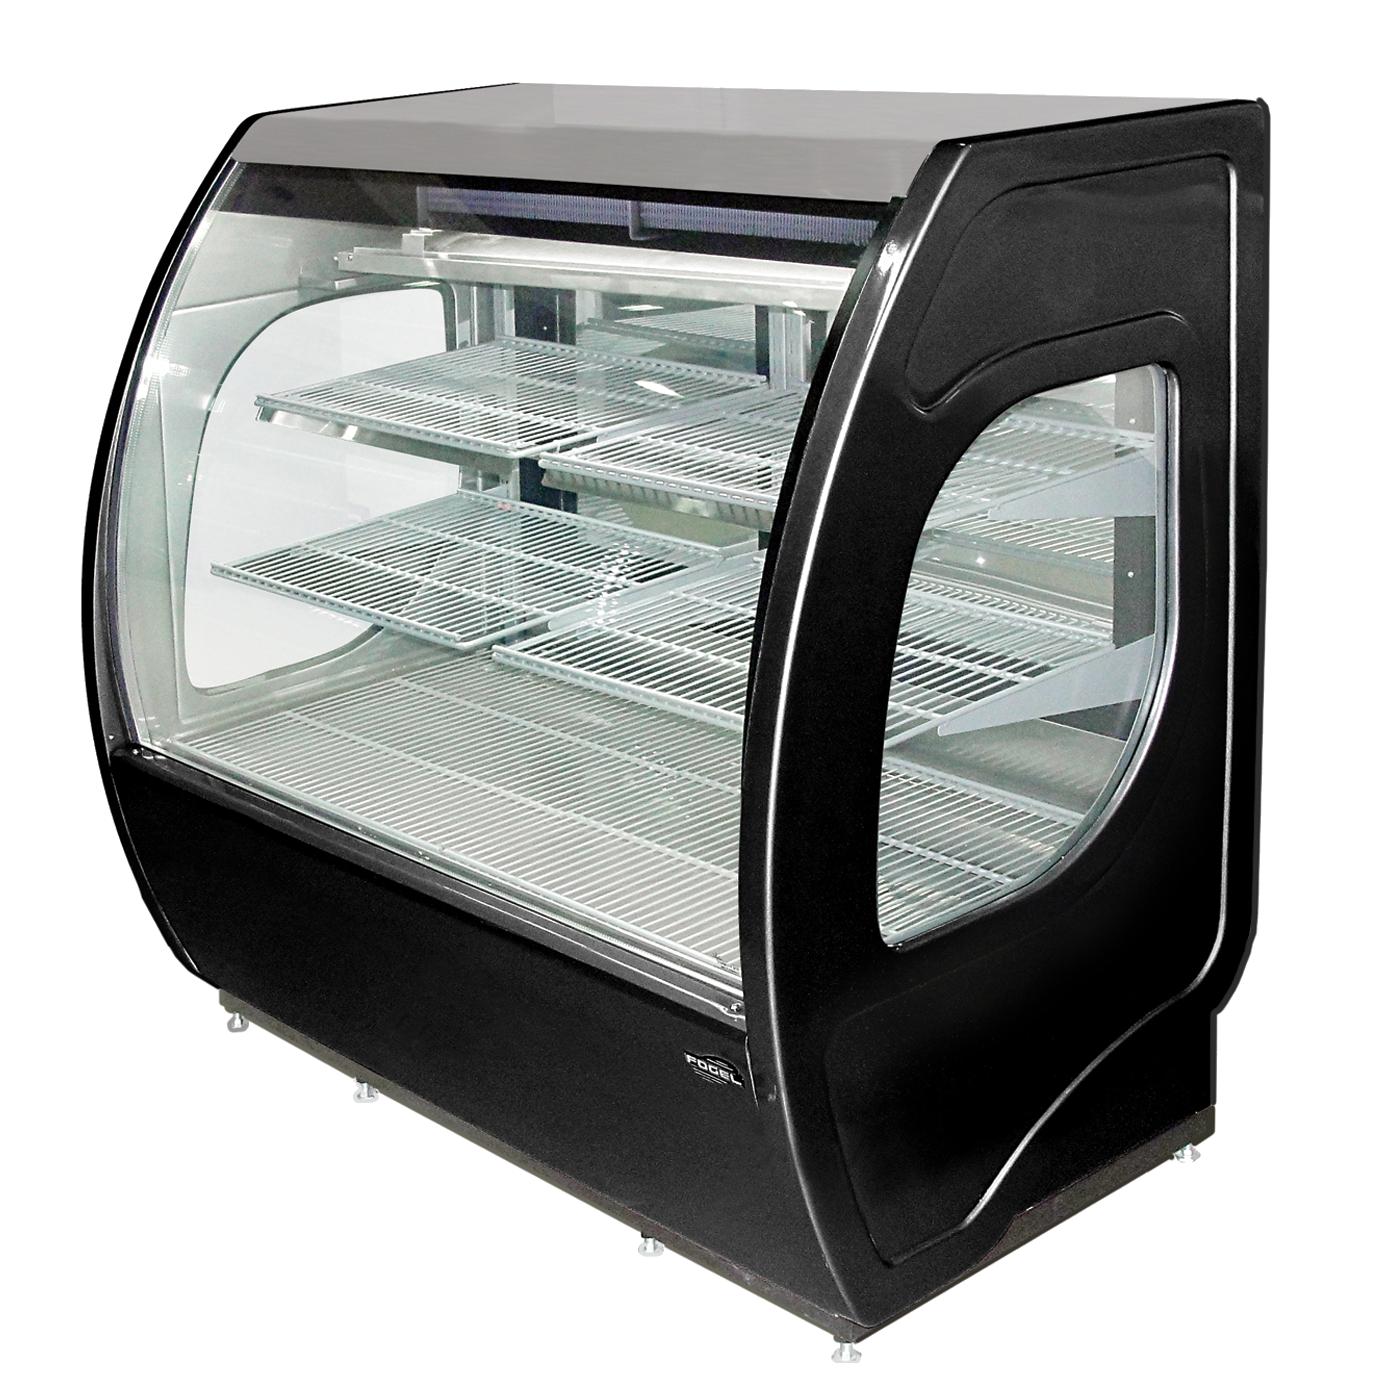 ELITE-6-PF-B Fogel USA display case, refrigerated bakery